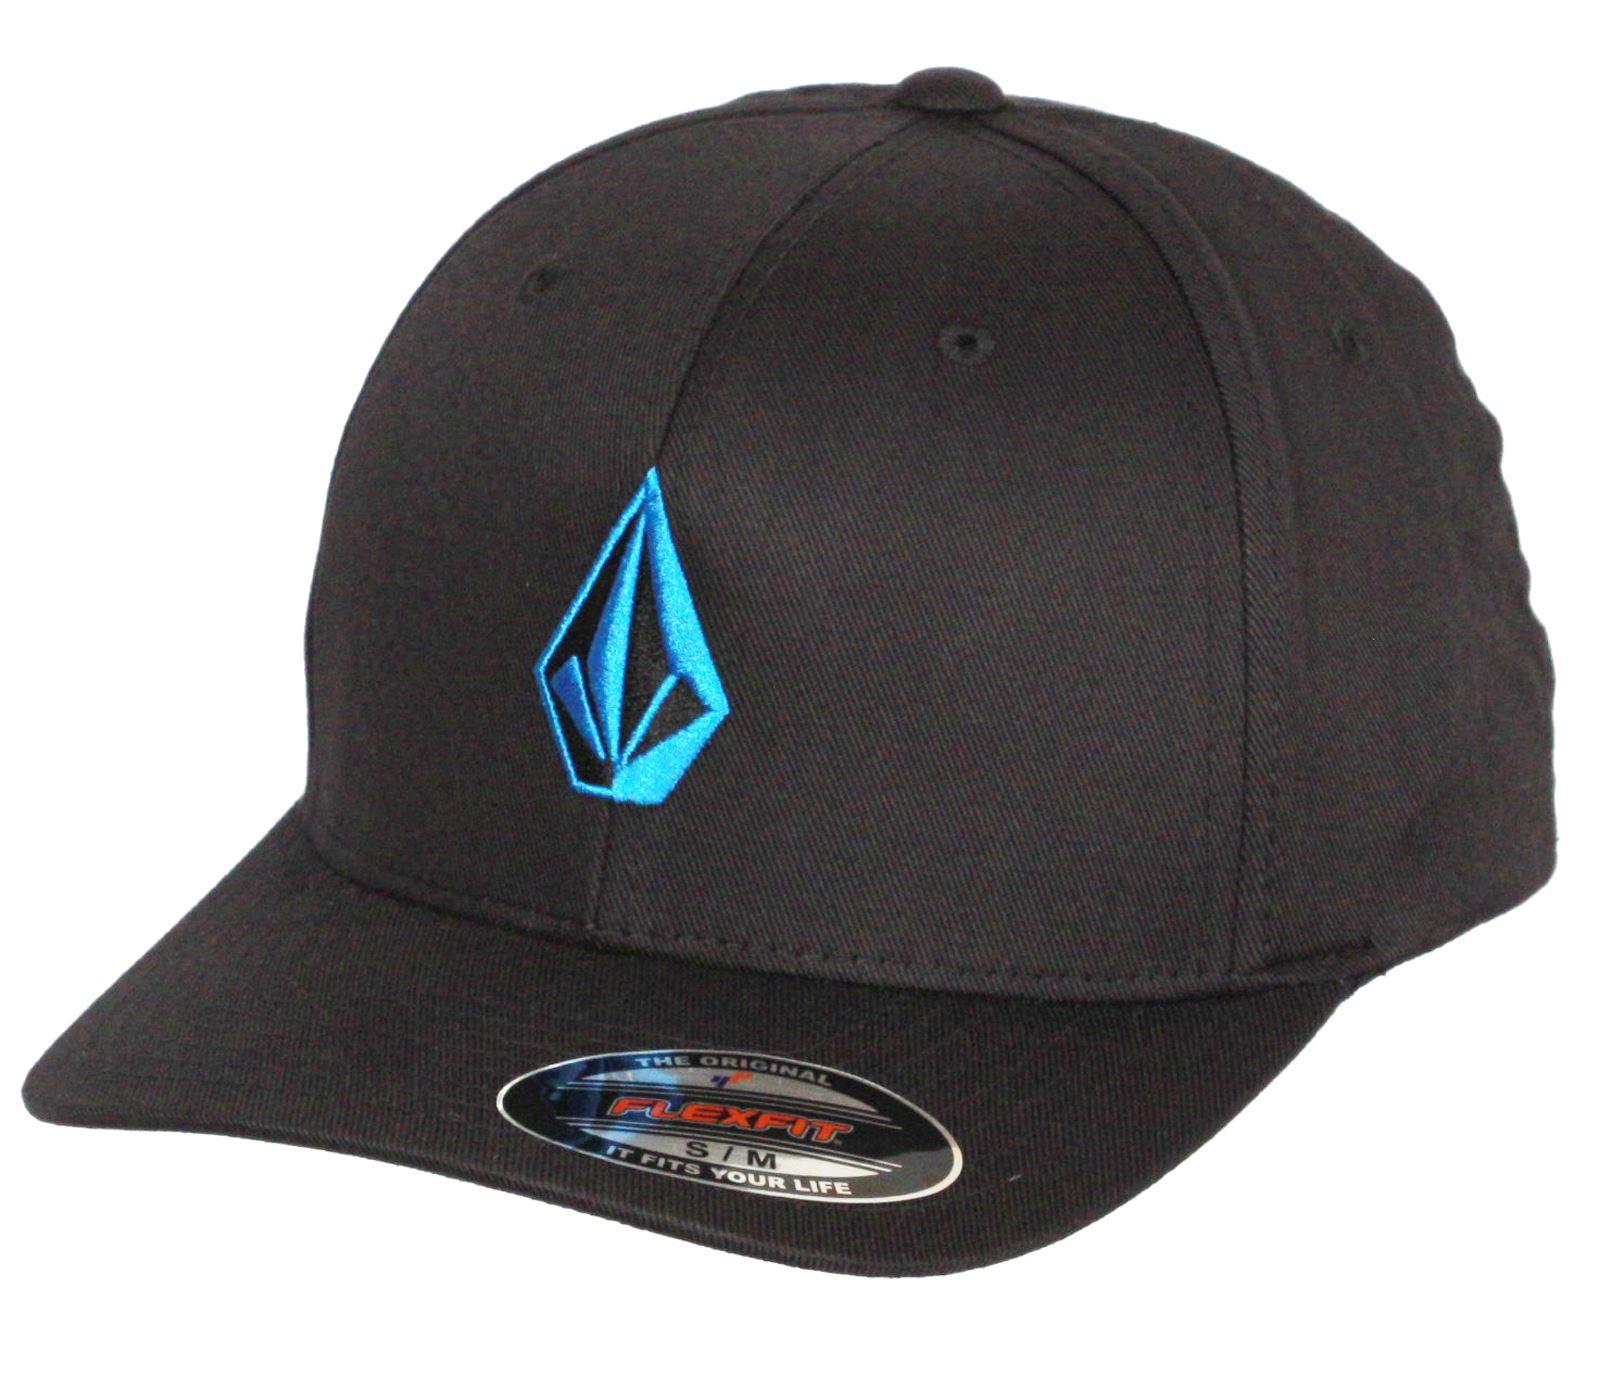 Volcom-Flexfit-Curve-Cap-Full-Stone-XFIT-dep